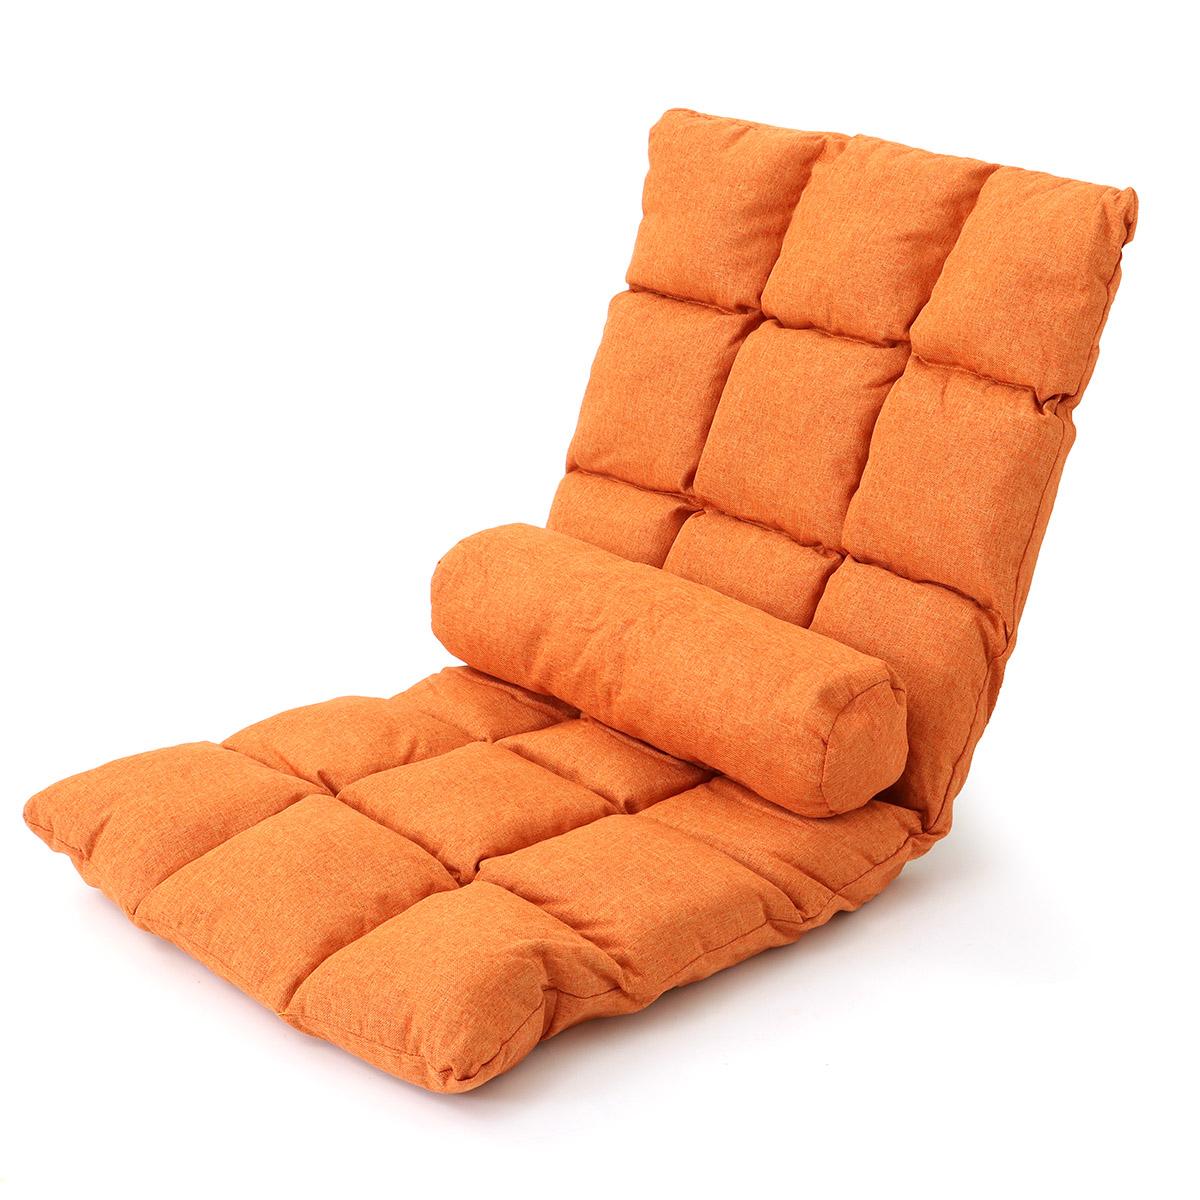 Adjustable 14-Position Floor Chair Cushion Folding Lazy Gaming Sofa Chair Pillow Cushion Home Office Small Sofa